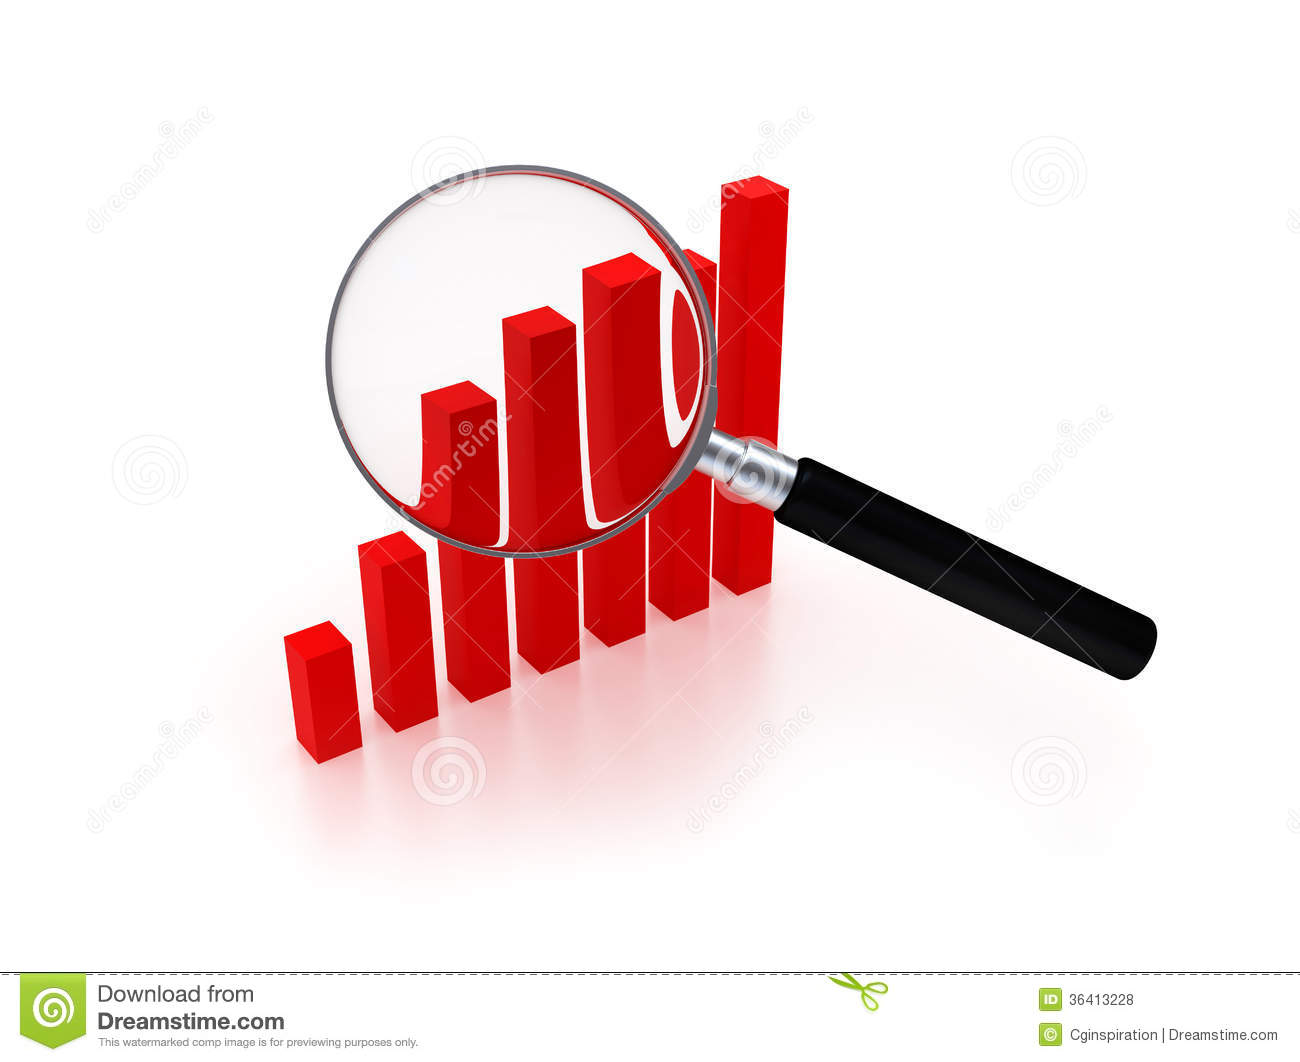 Data Free Clipart #1-Data Free Clipart #1-14